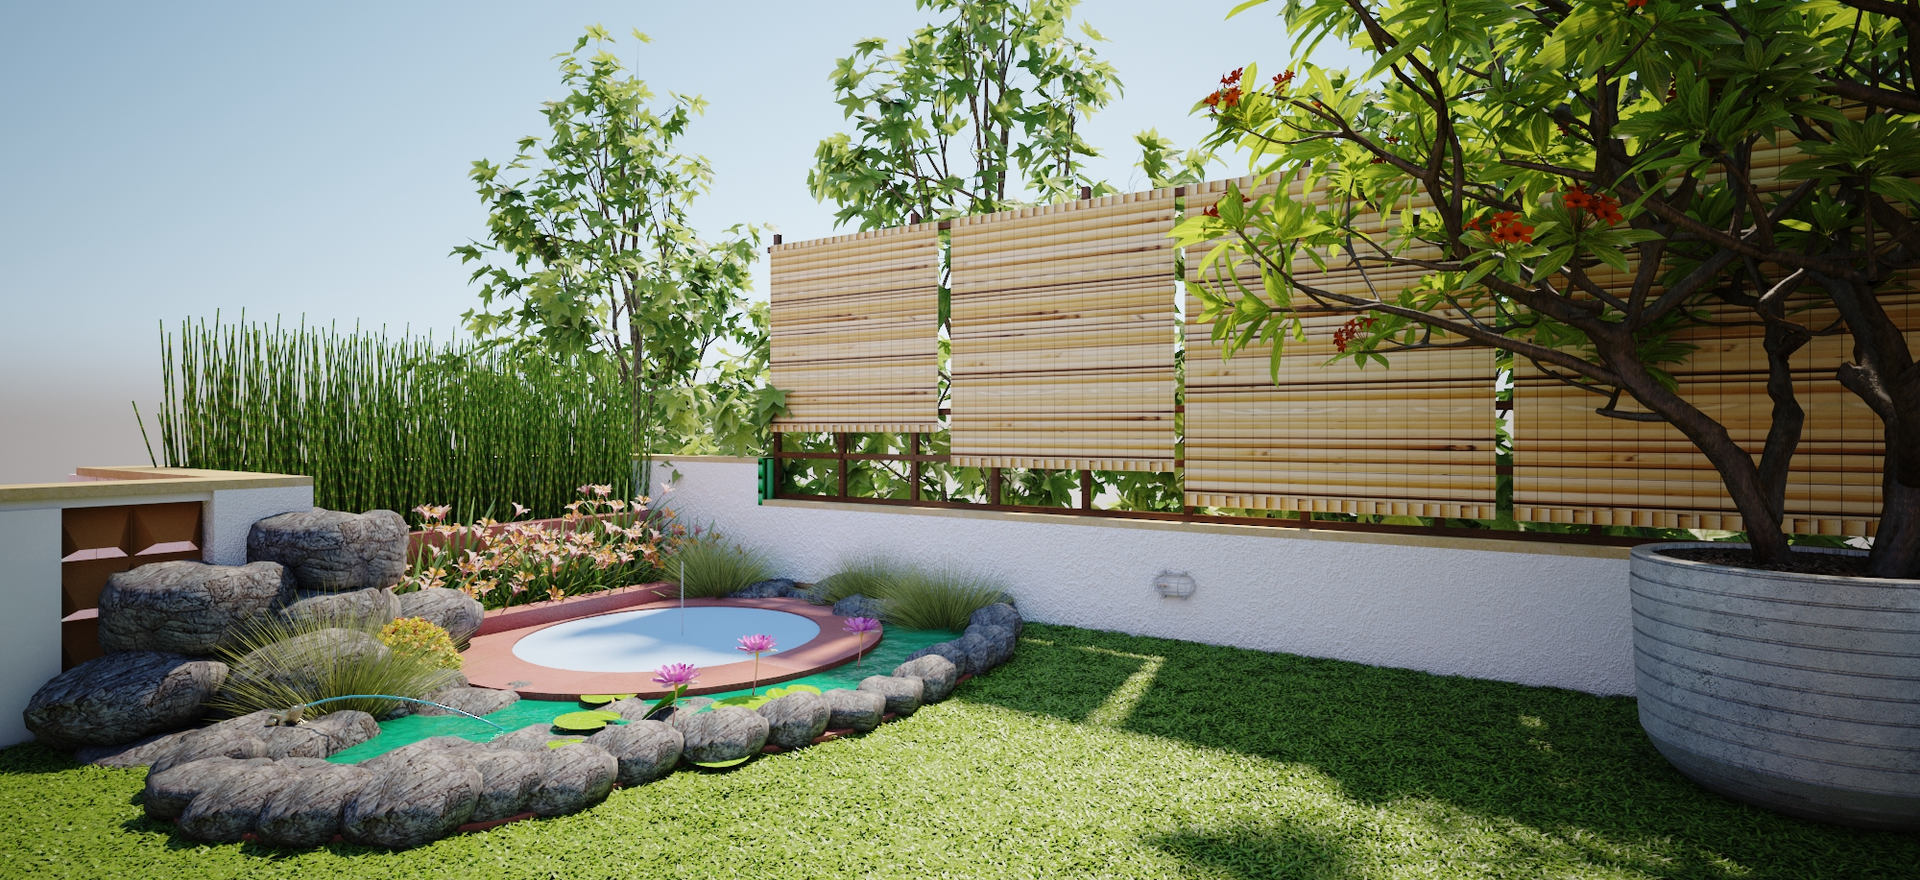 kerala style landscape bangalore (4).jpg